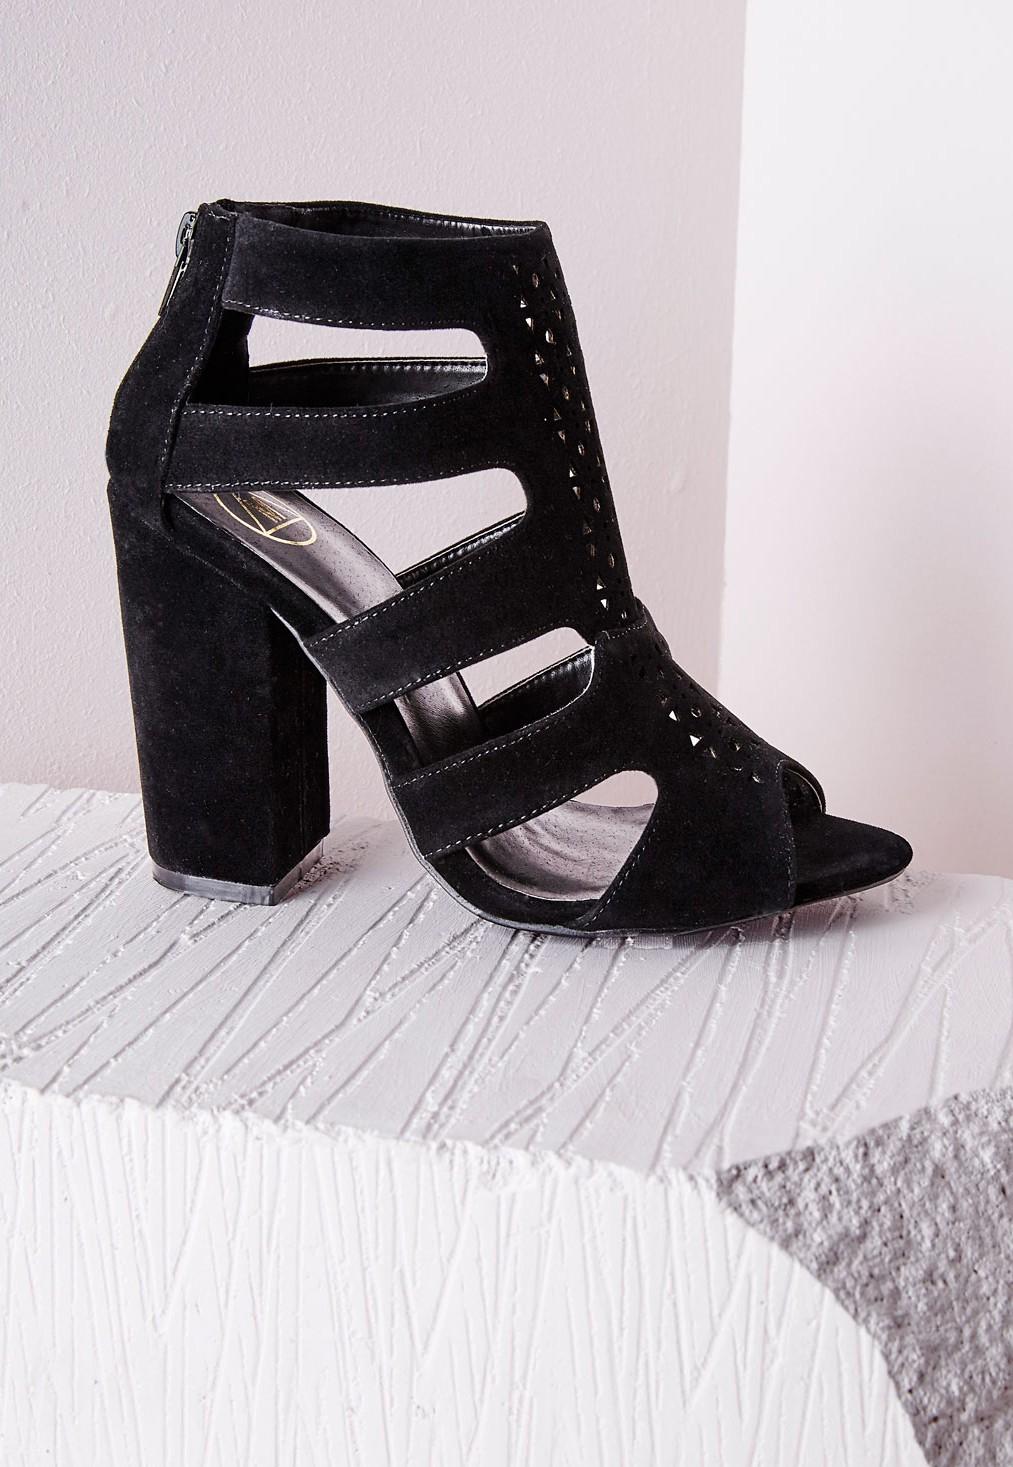 d68aaa8ae59 Missguided Block Heel Gladiator Sandals Black in Black - Lyst